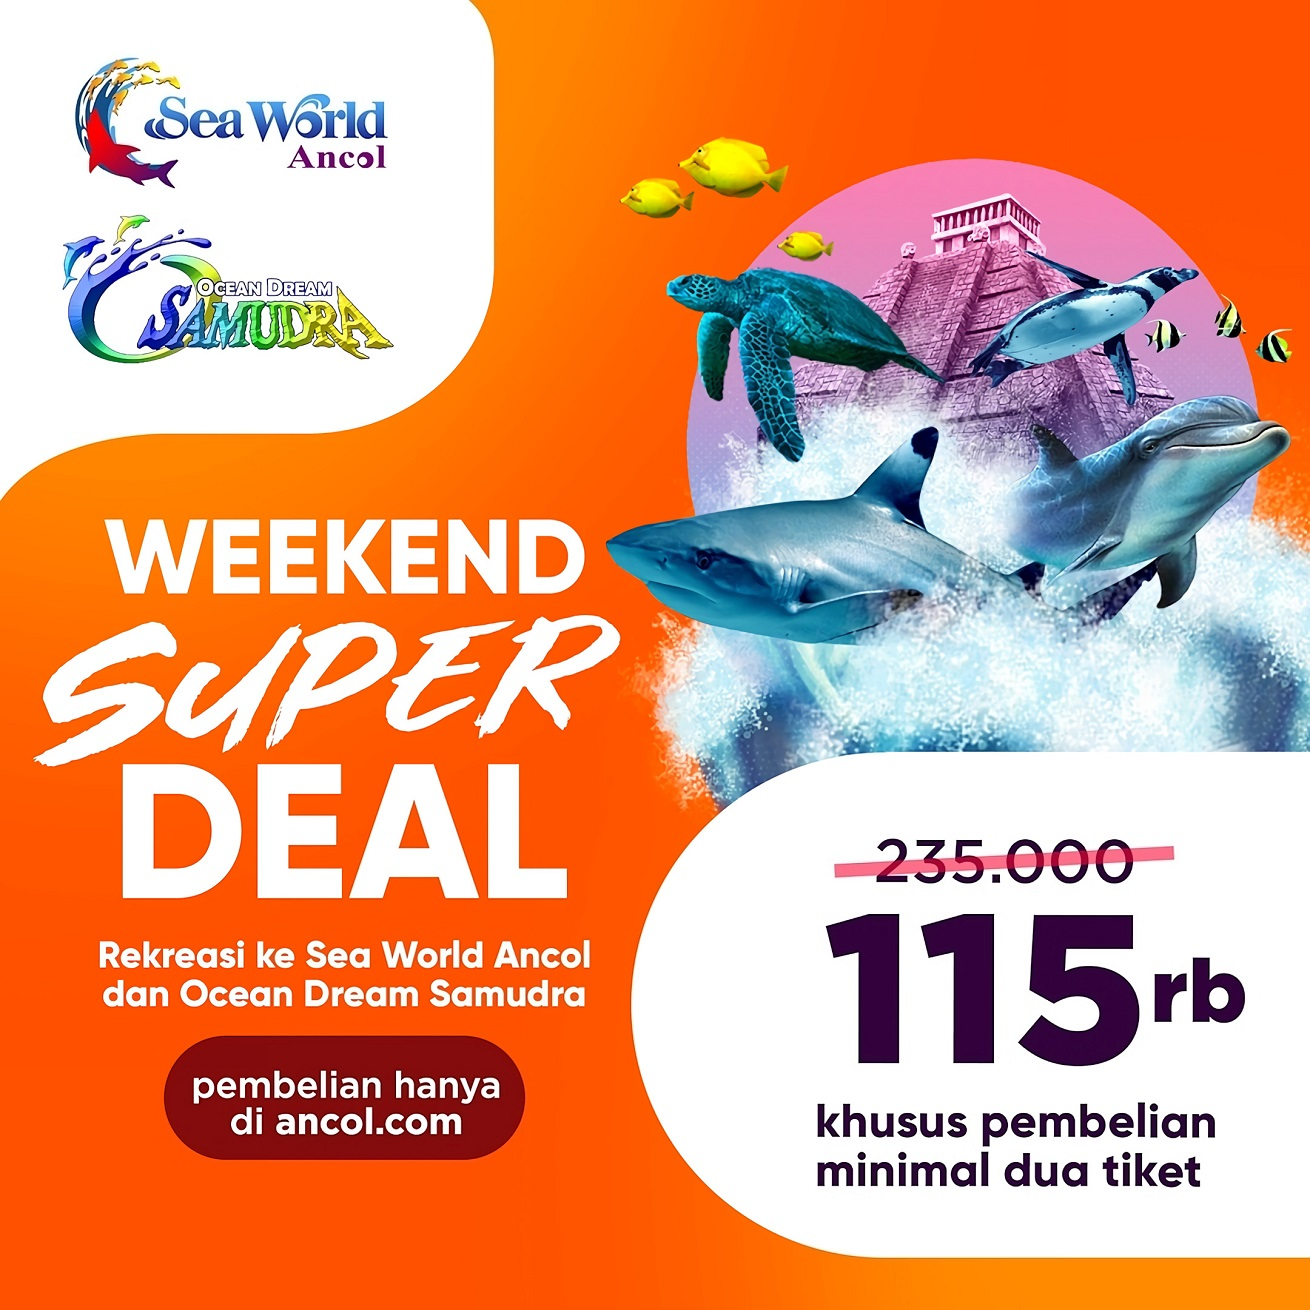 Promo Seaworld Weekend Super Deal hanya Rp. 140.000 All Day